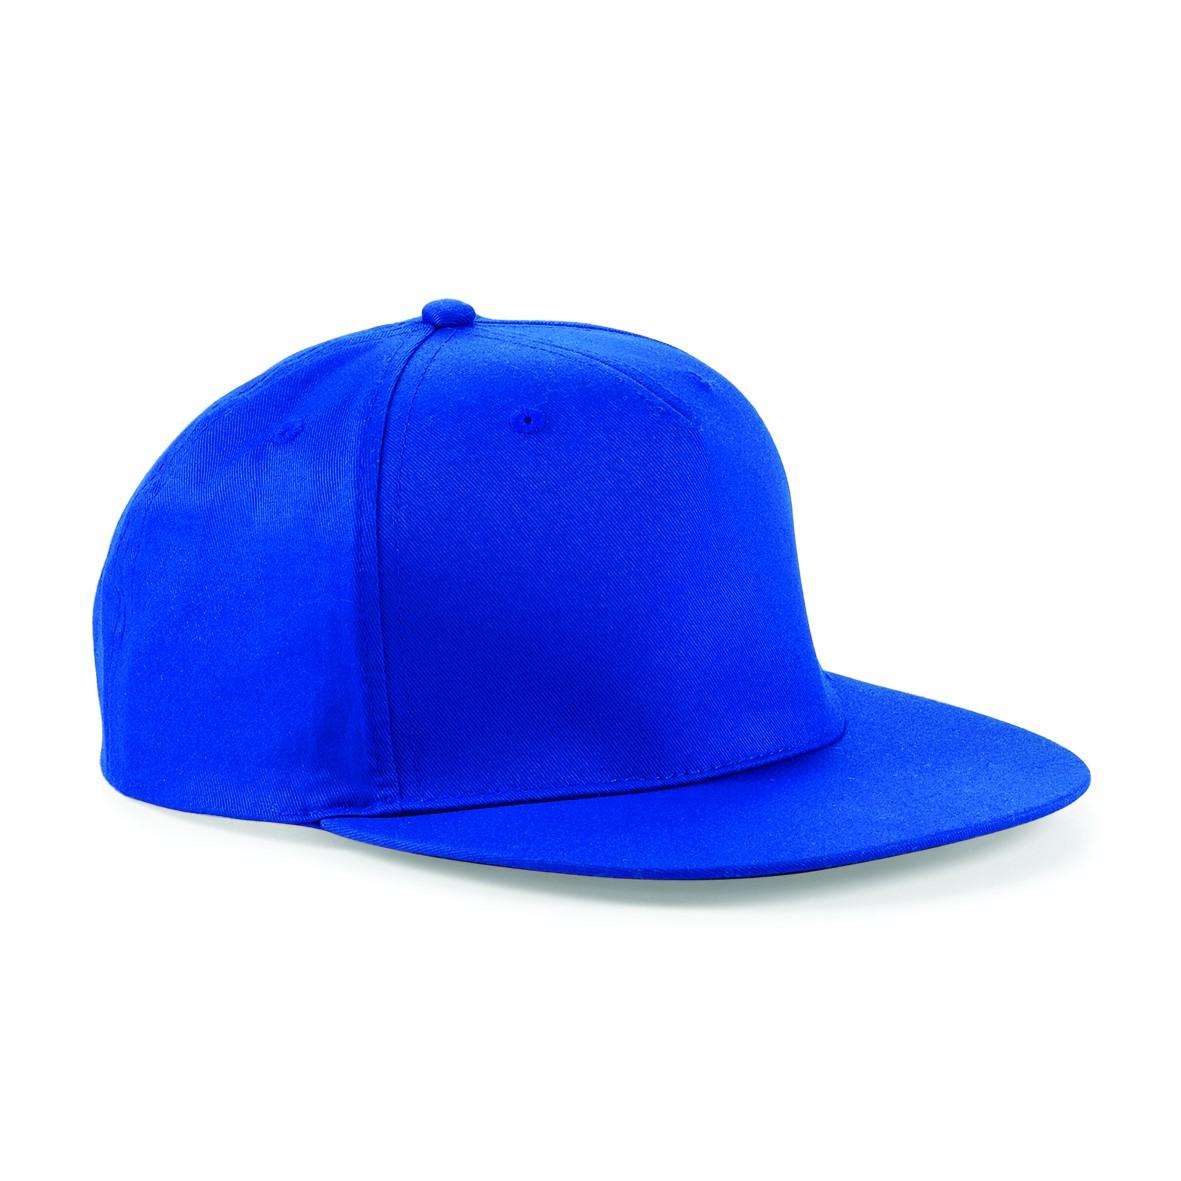 c26a0ac5b53 New PREMIUM Snapback Cap Black Plain Baseball Hip Hop Era Fitted Flat Peak  Hat